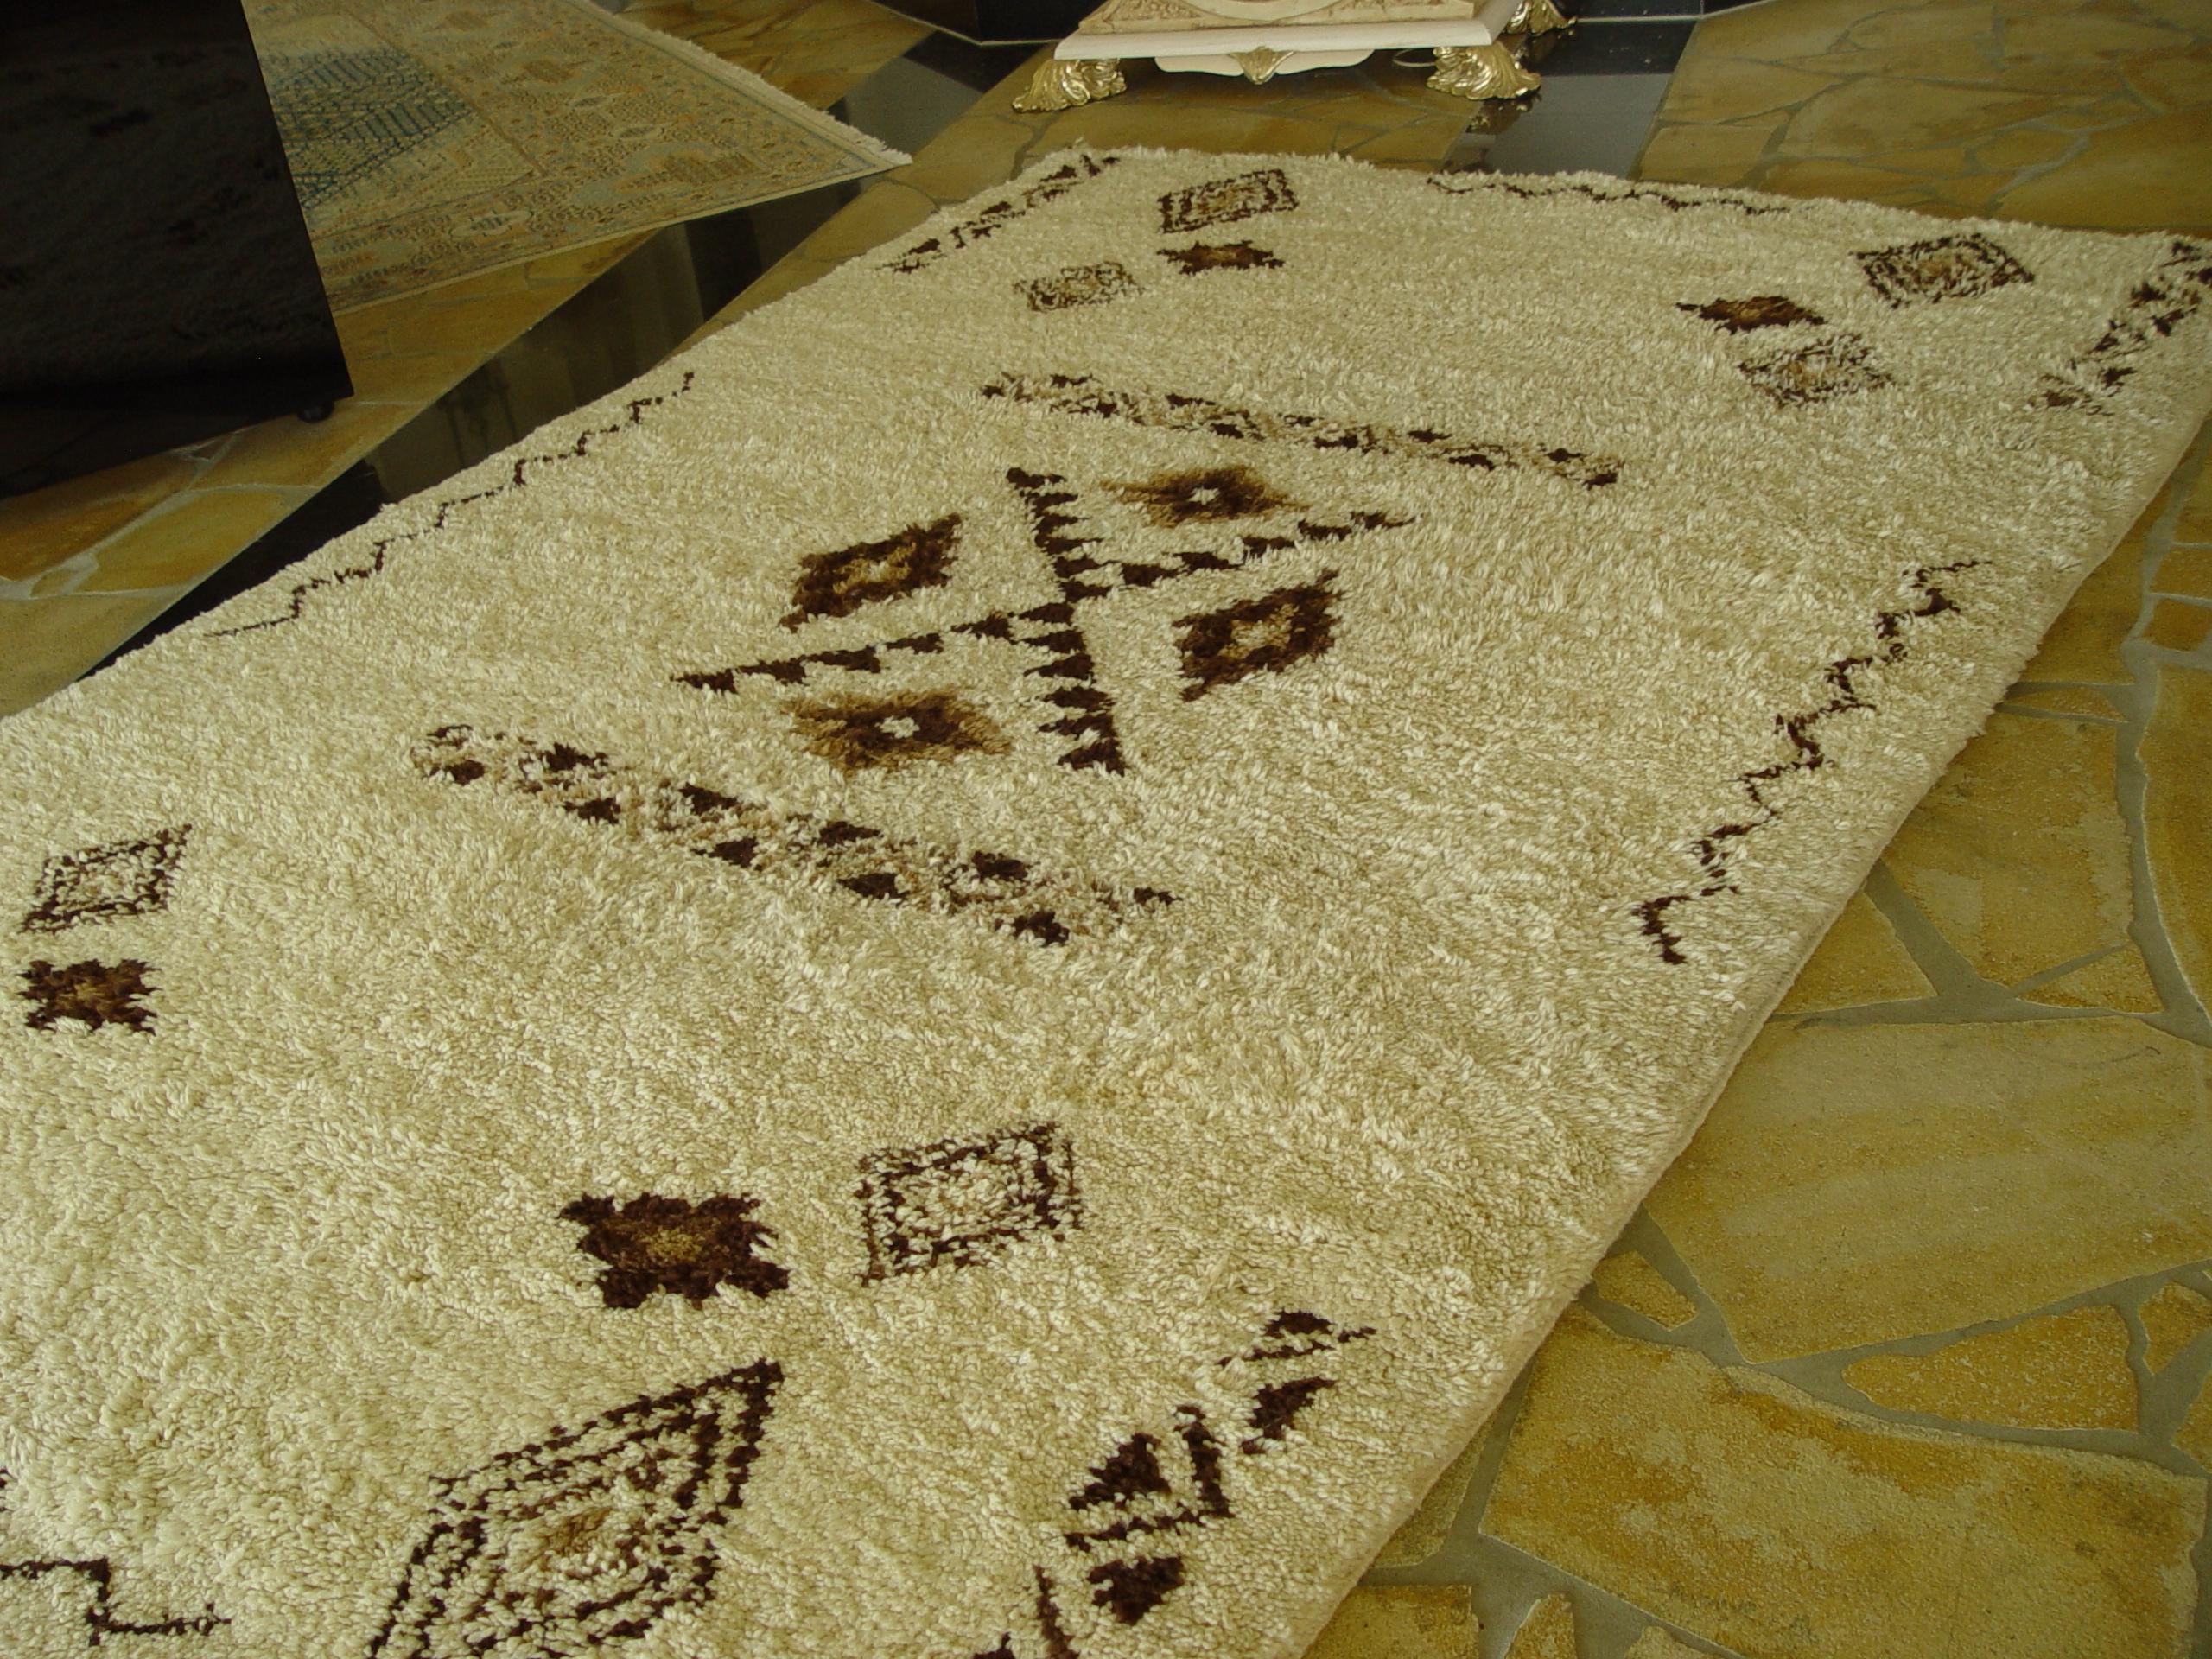 vintage berber superieure teppich 3m x 2m ebay. Black Bedroom Furniture Sets. Home Design Ideas